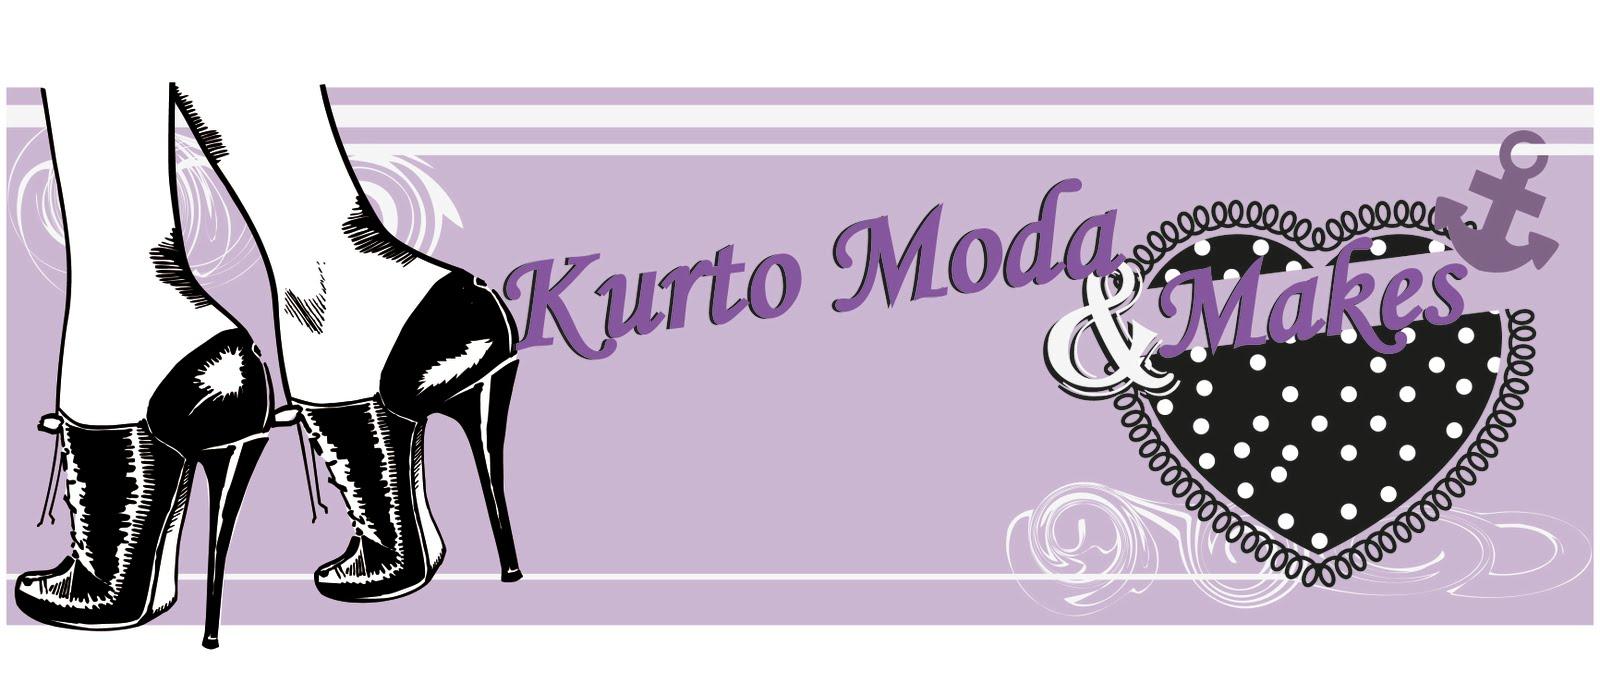 Kurto Moda & Makes!!!